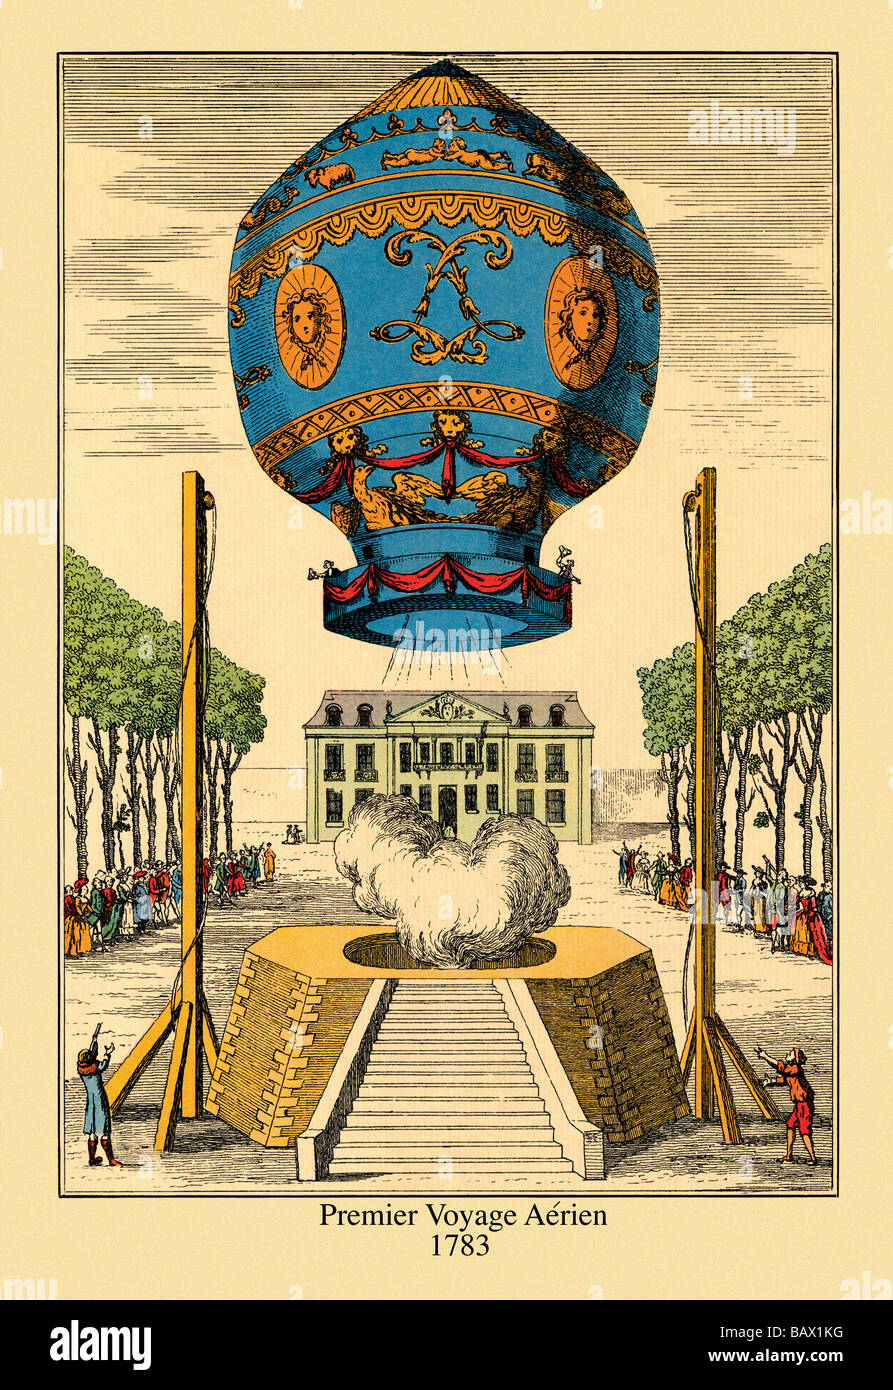 Premier Voyage Aerien,1783 - Stock Image